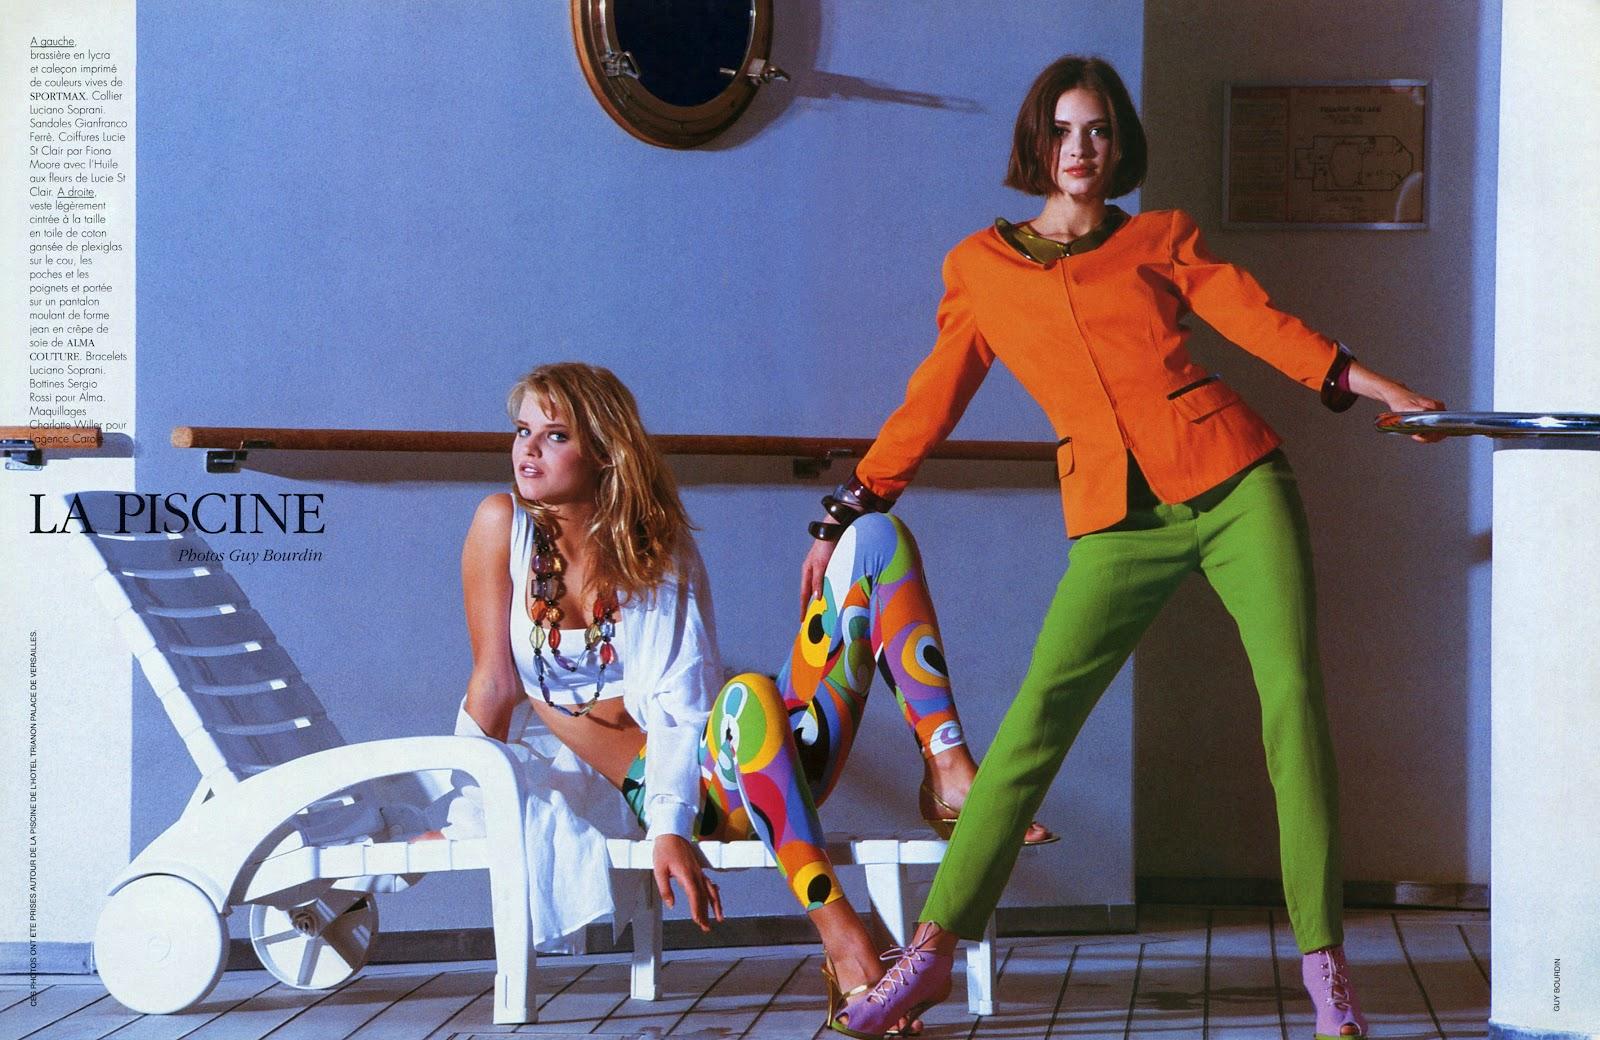 http://3.bp.blogspot.com/-5eR5RbzVgkI/T2Nx8zcs6PI/AAAAAAAAE8g/4ZFOKKhszaU/s1600/1991+04+Harper%27s+Bazaar+Fr+Ph+Guy+Bourdin+001+Eva+Herzigova+Patricia+Hartmann.jpg